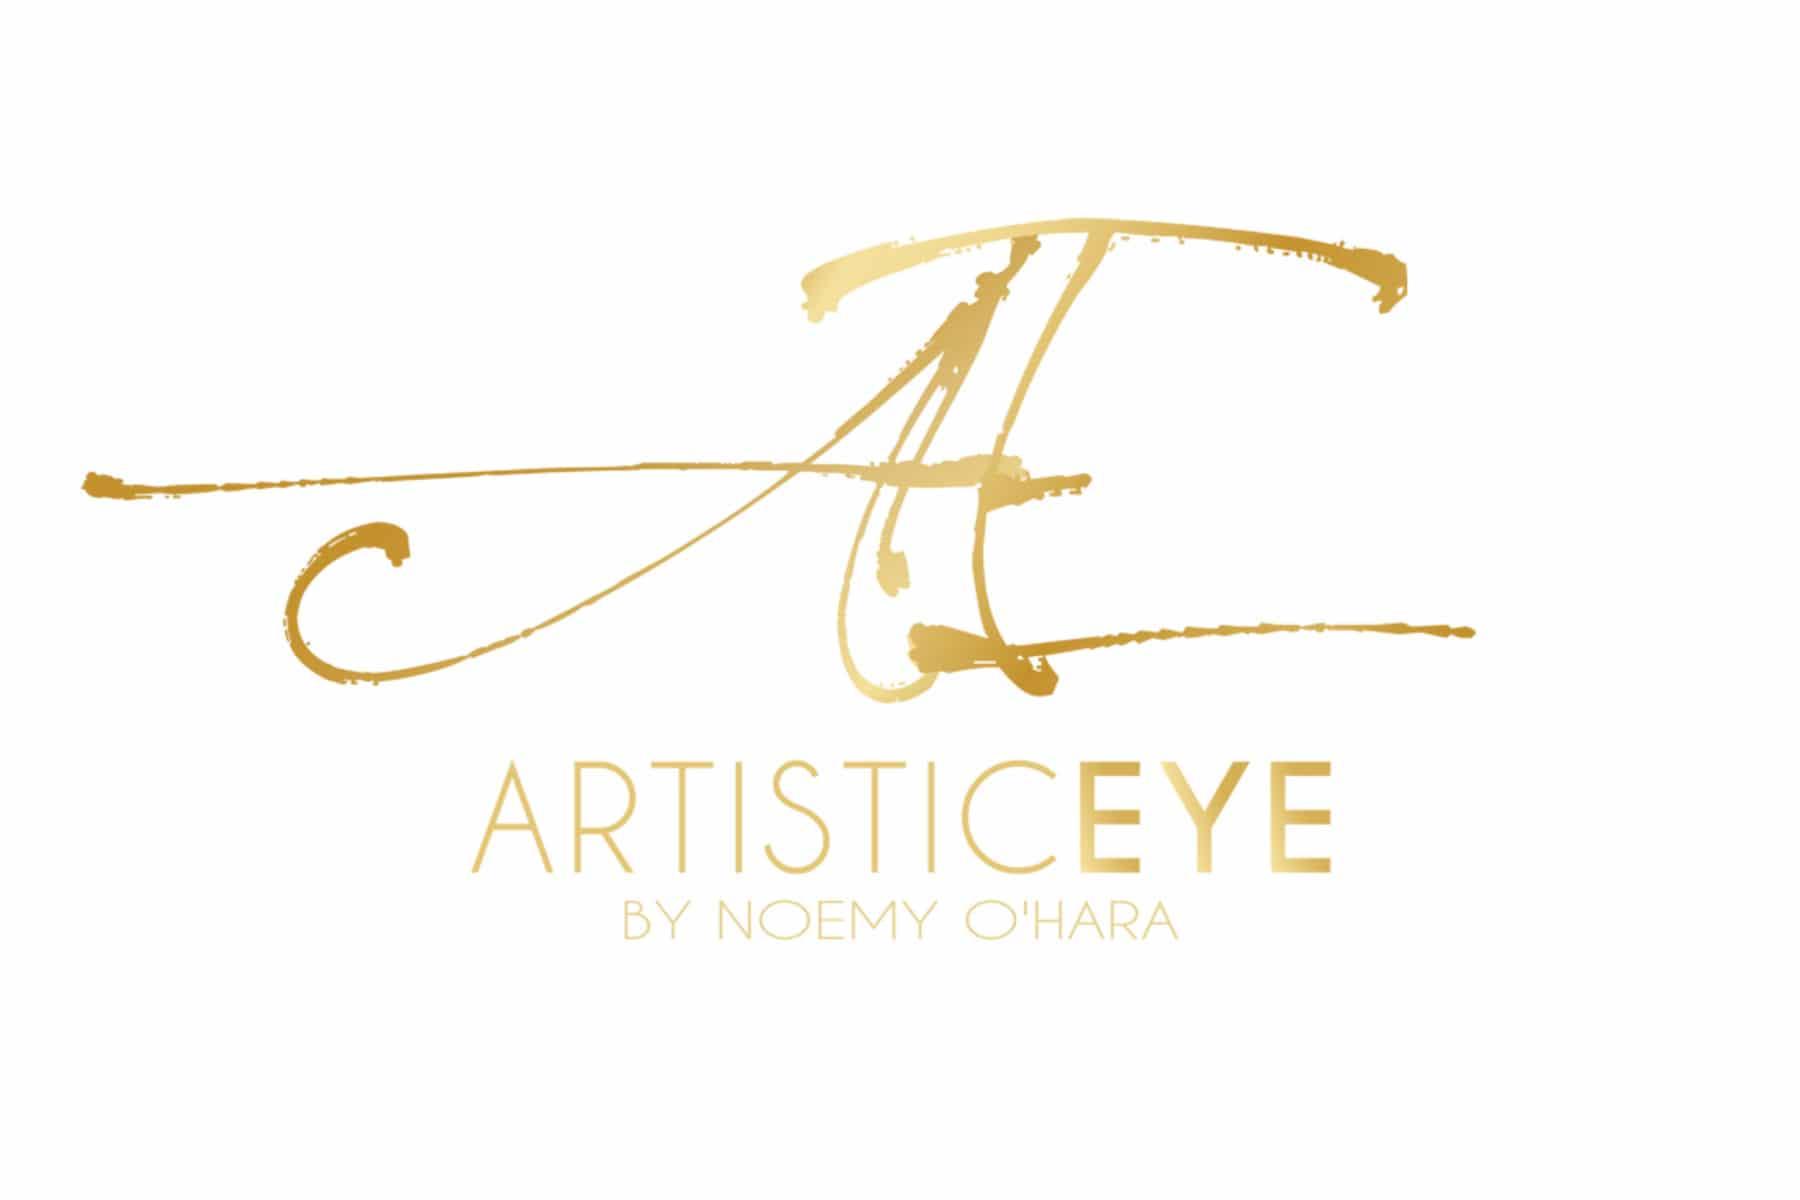 Artistic Eye by Noemy O'Hara